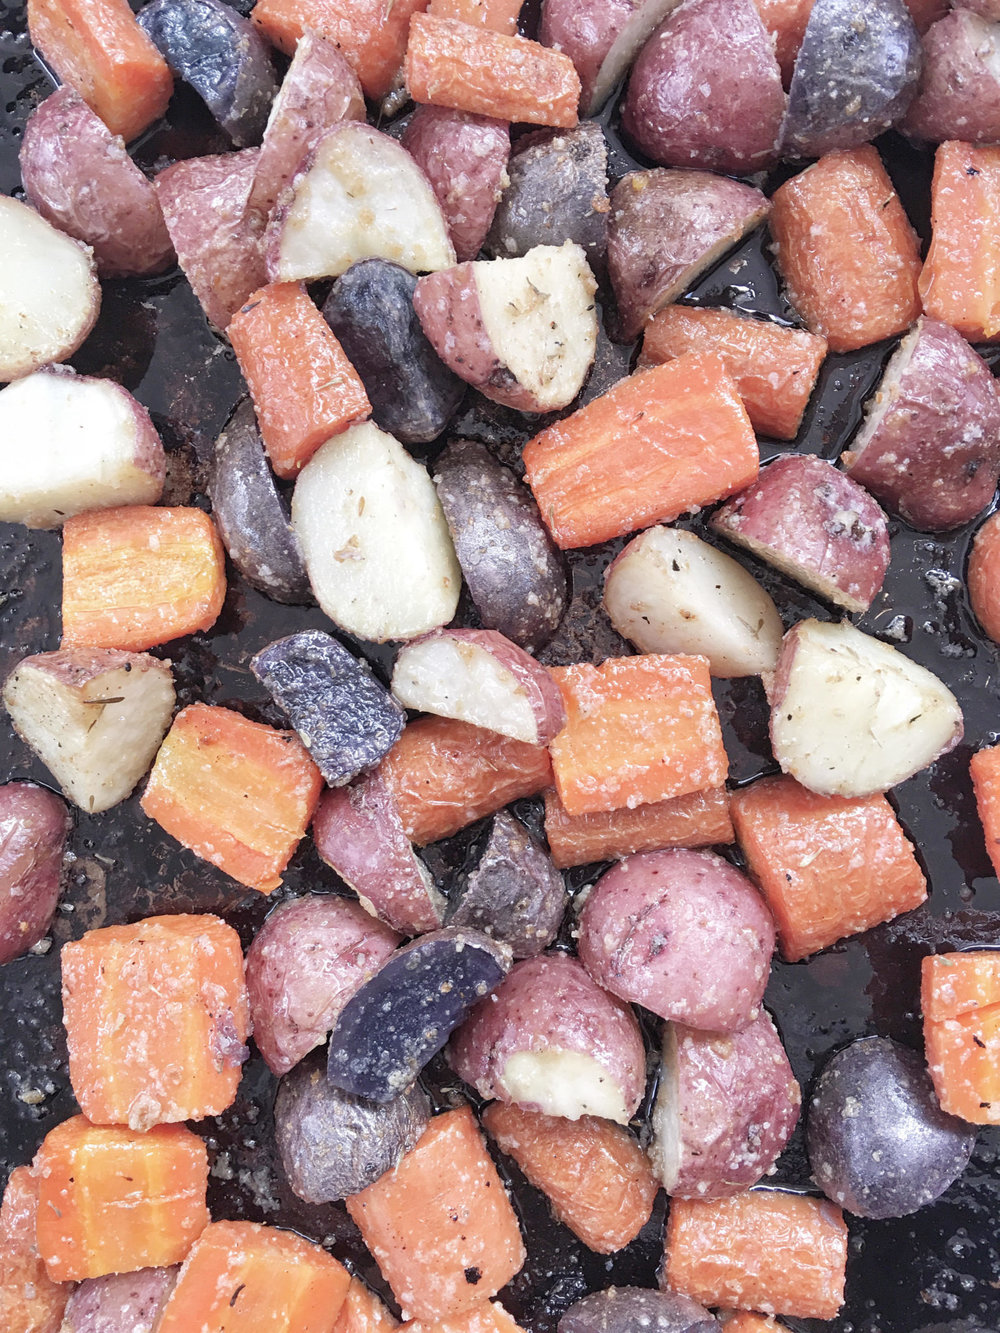 roasted-veg-w-dip-2